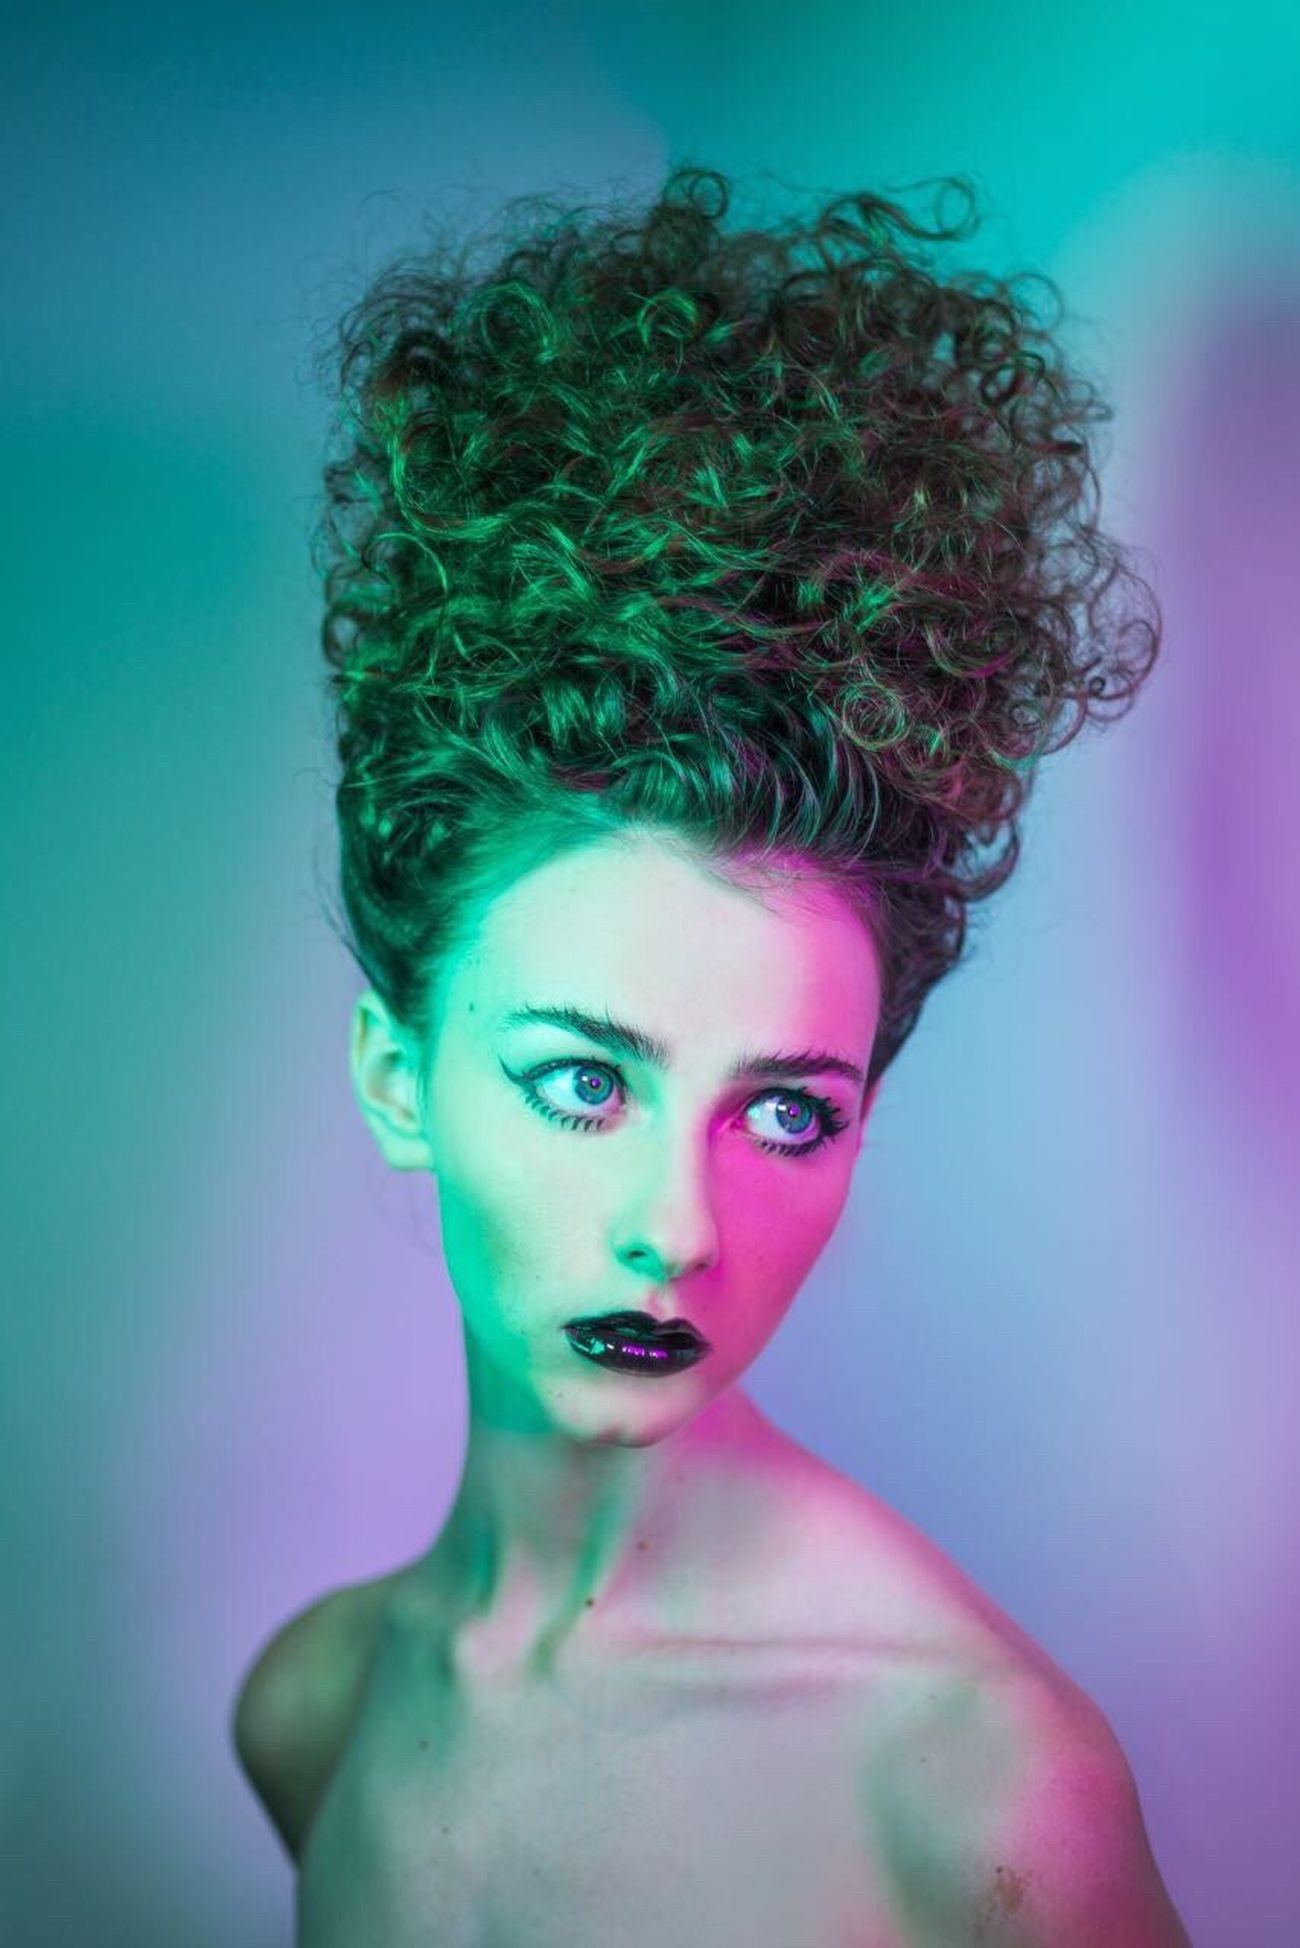 Studio Shot Portrait Fashion Only Women Beautiful Woman Make-up Young Women Curly Hair This Week On Eyeem TheWeekOnEyeEM BYOPaper!